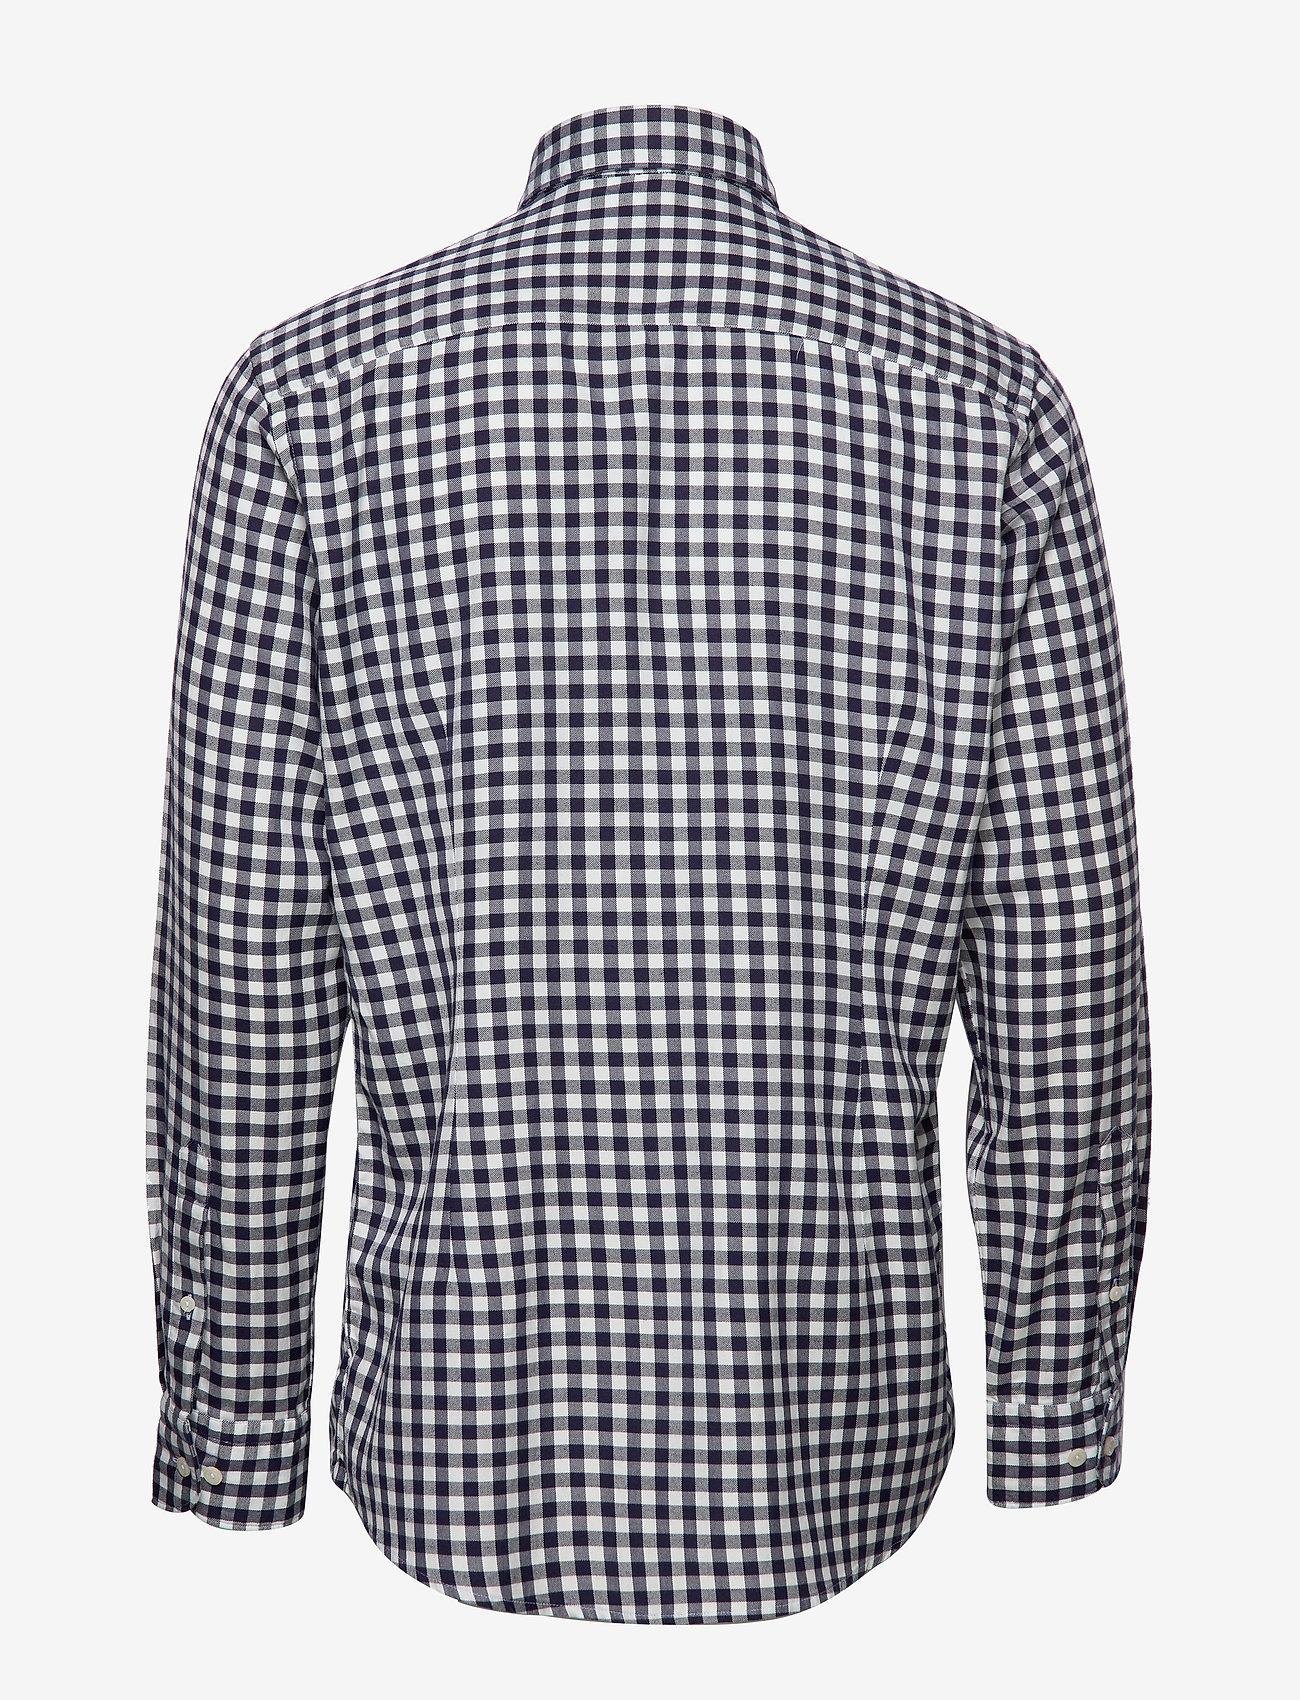 Soft Navy Gingham Checked Cotton-tencel Shirt (Blue) (103.35 €) - Eton pmmY1